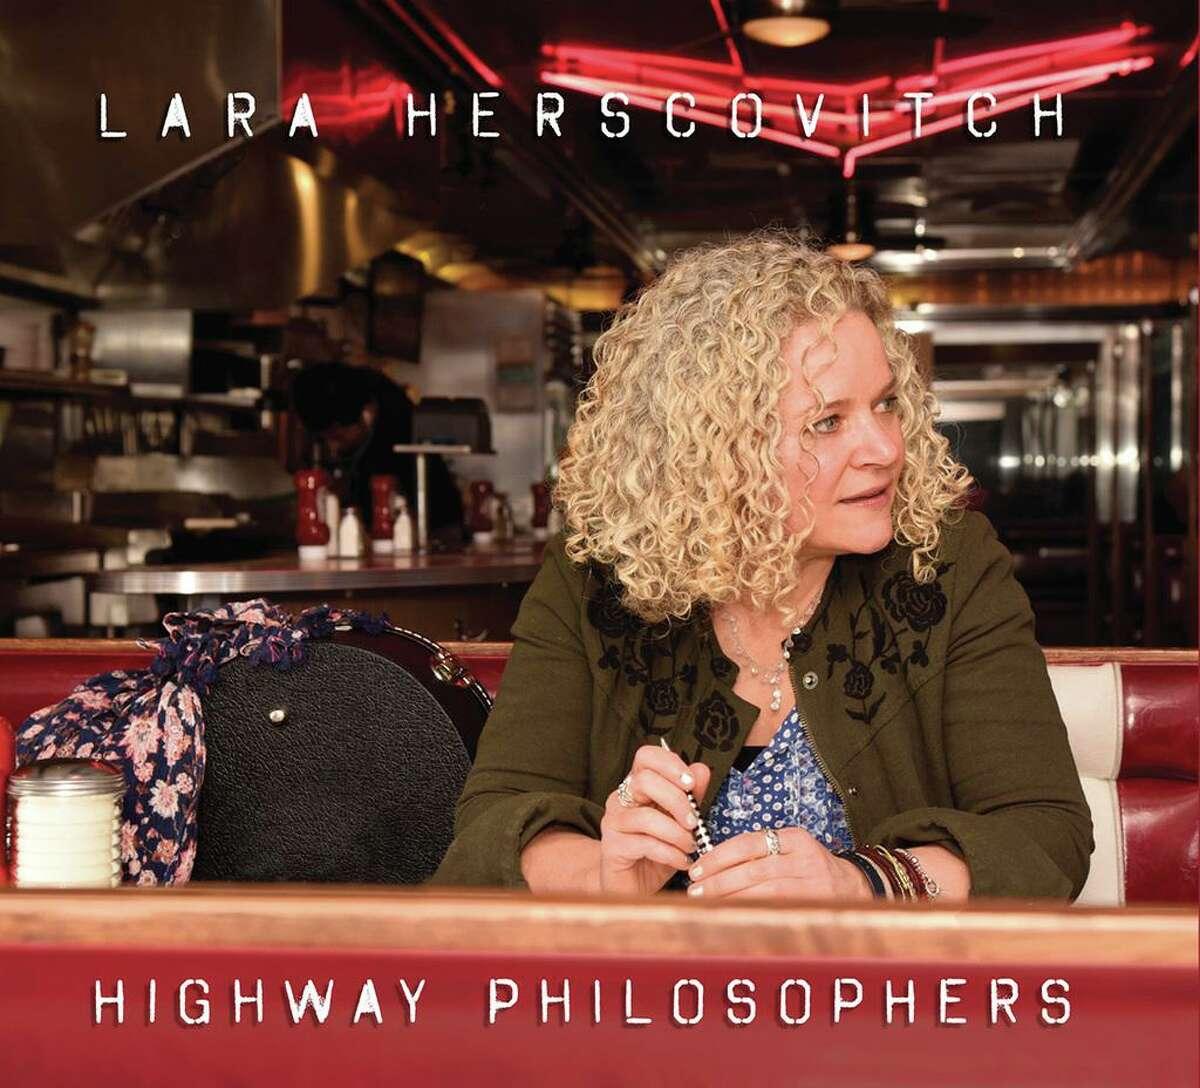 Highway Philosophers, album cover.